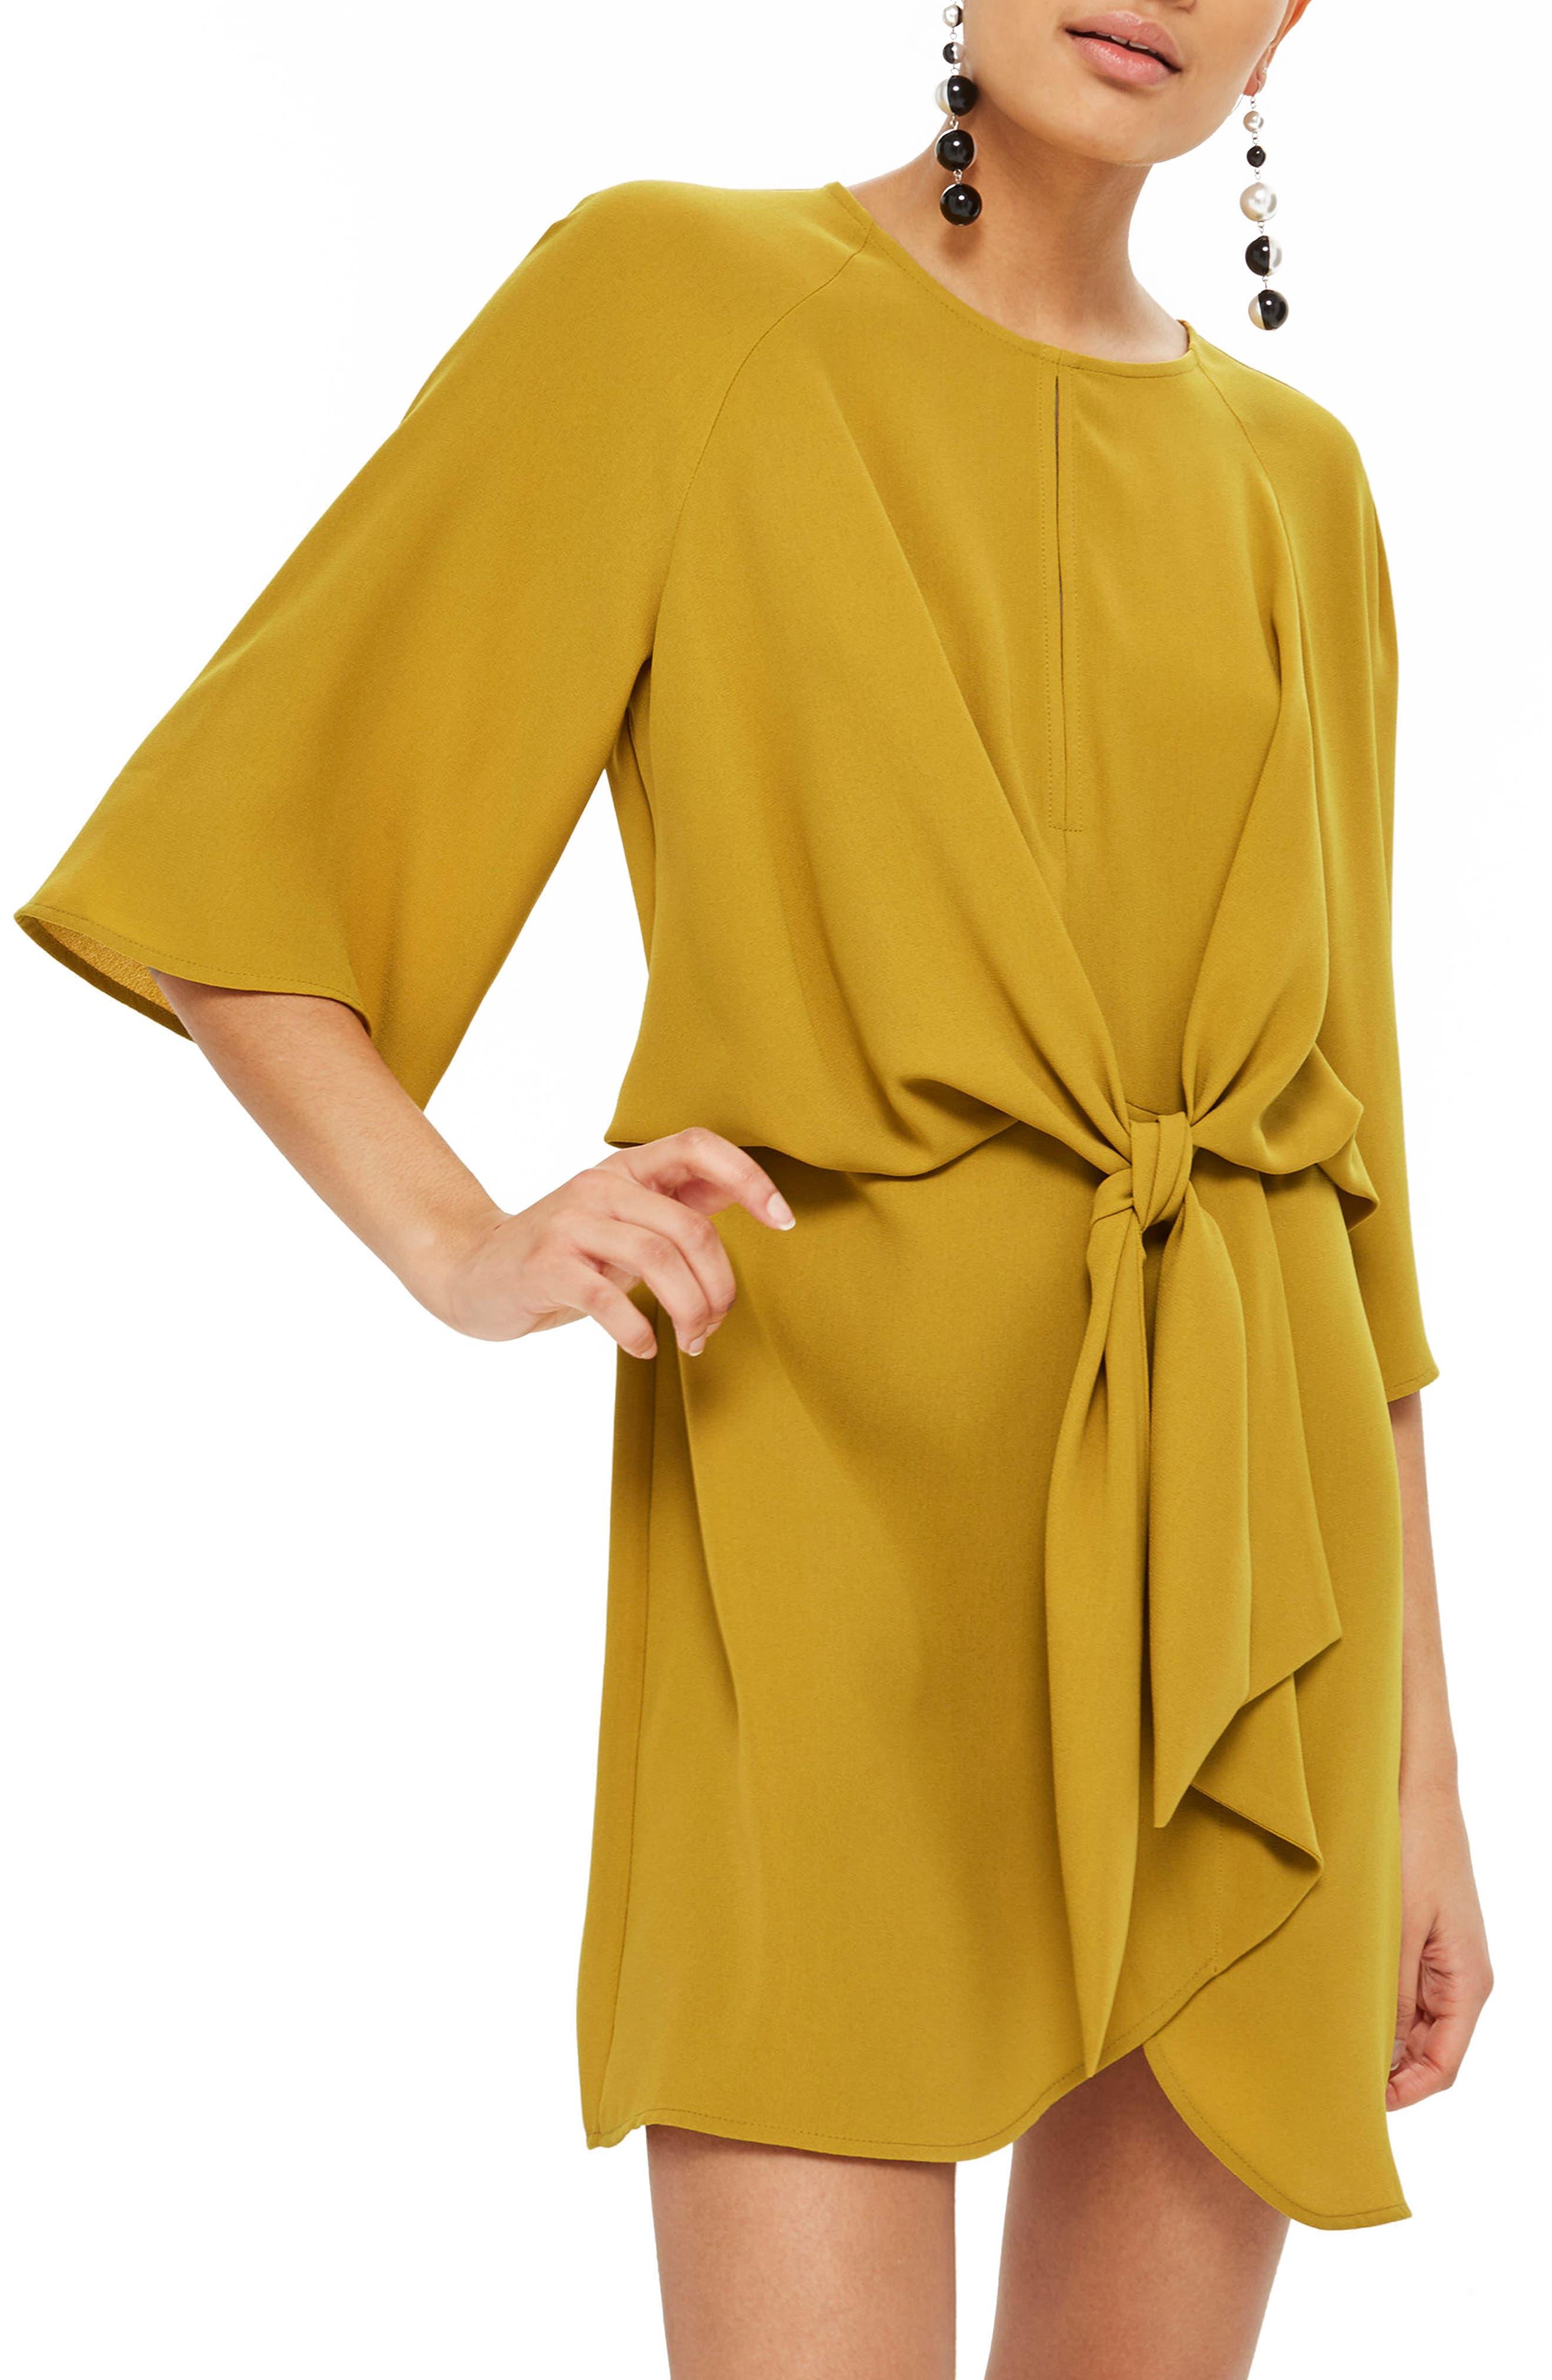 Tie Front Minidress,                             Main thumbnail 1, color,                             Mustard